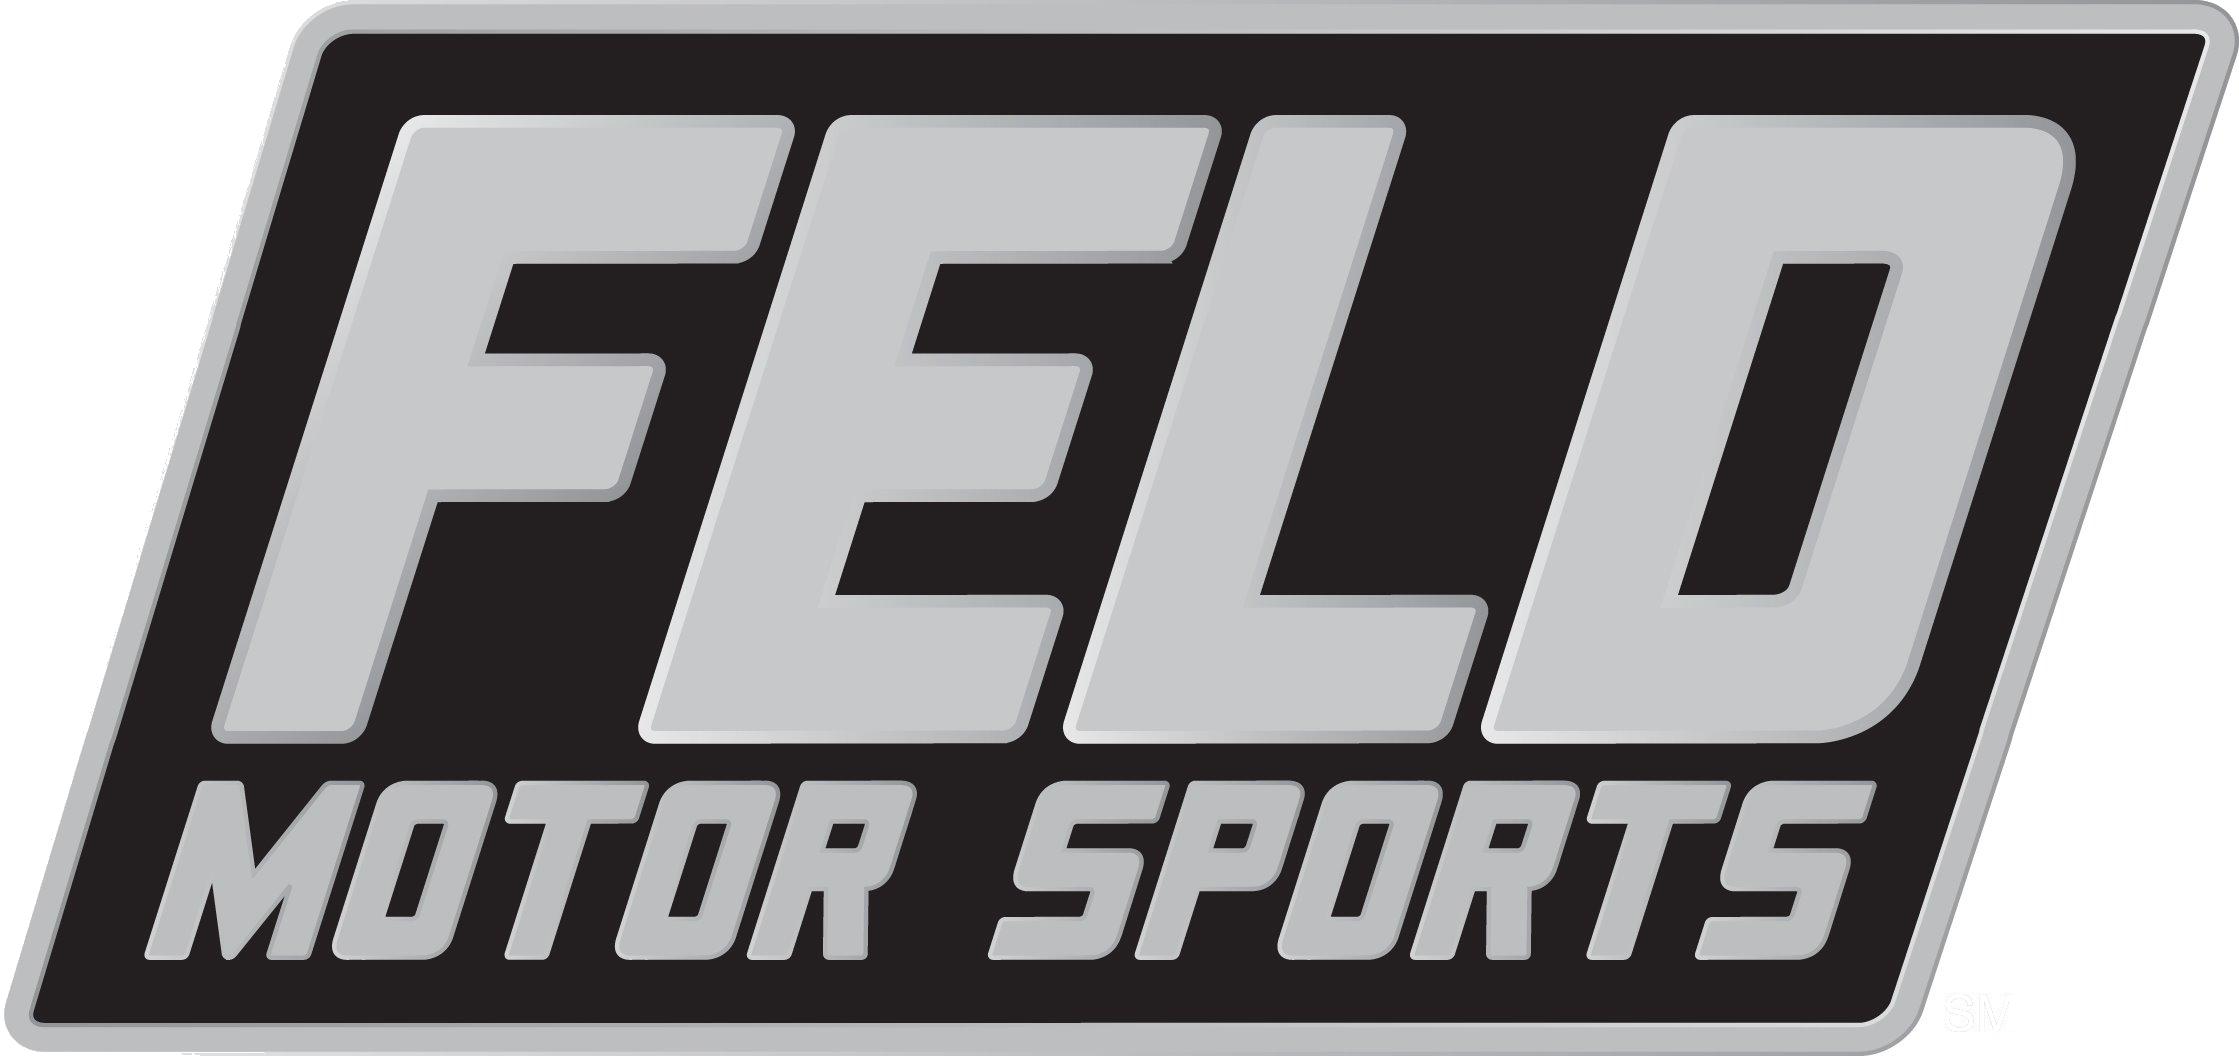 Feld Motor Sports.png